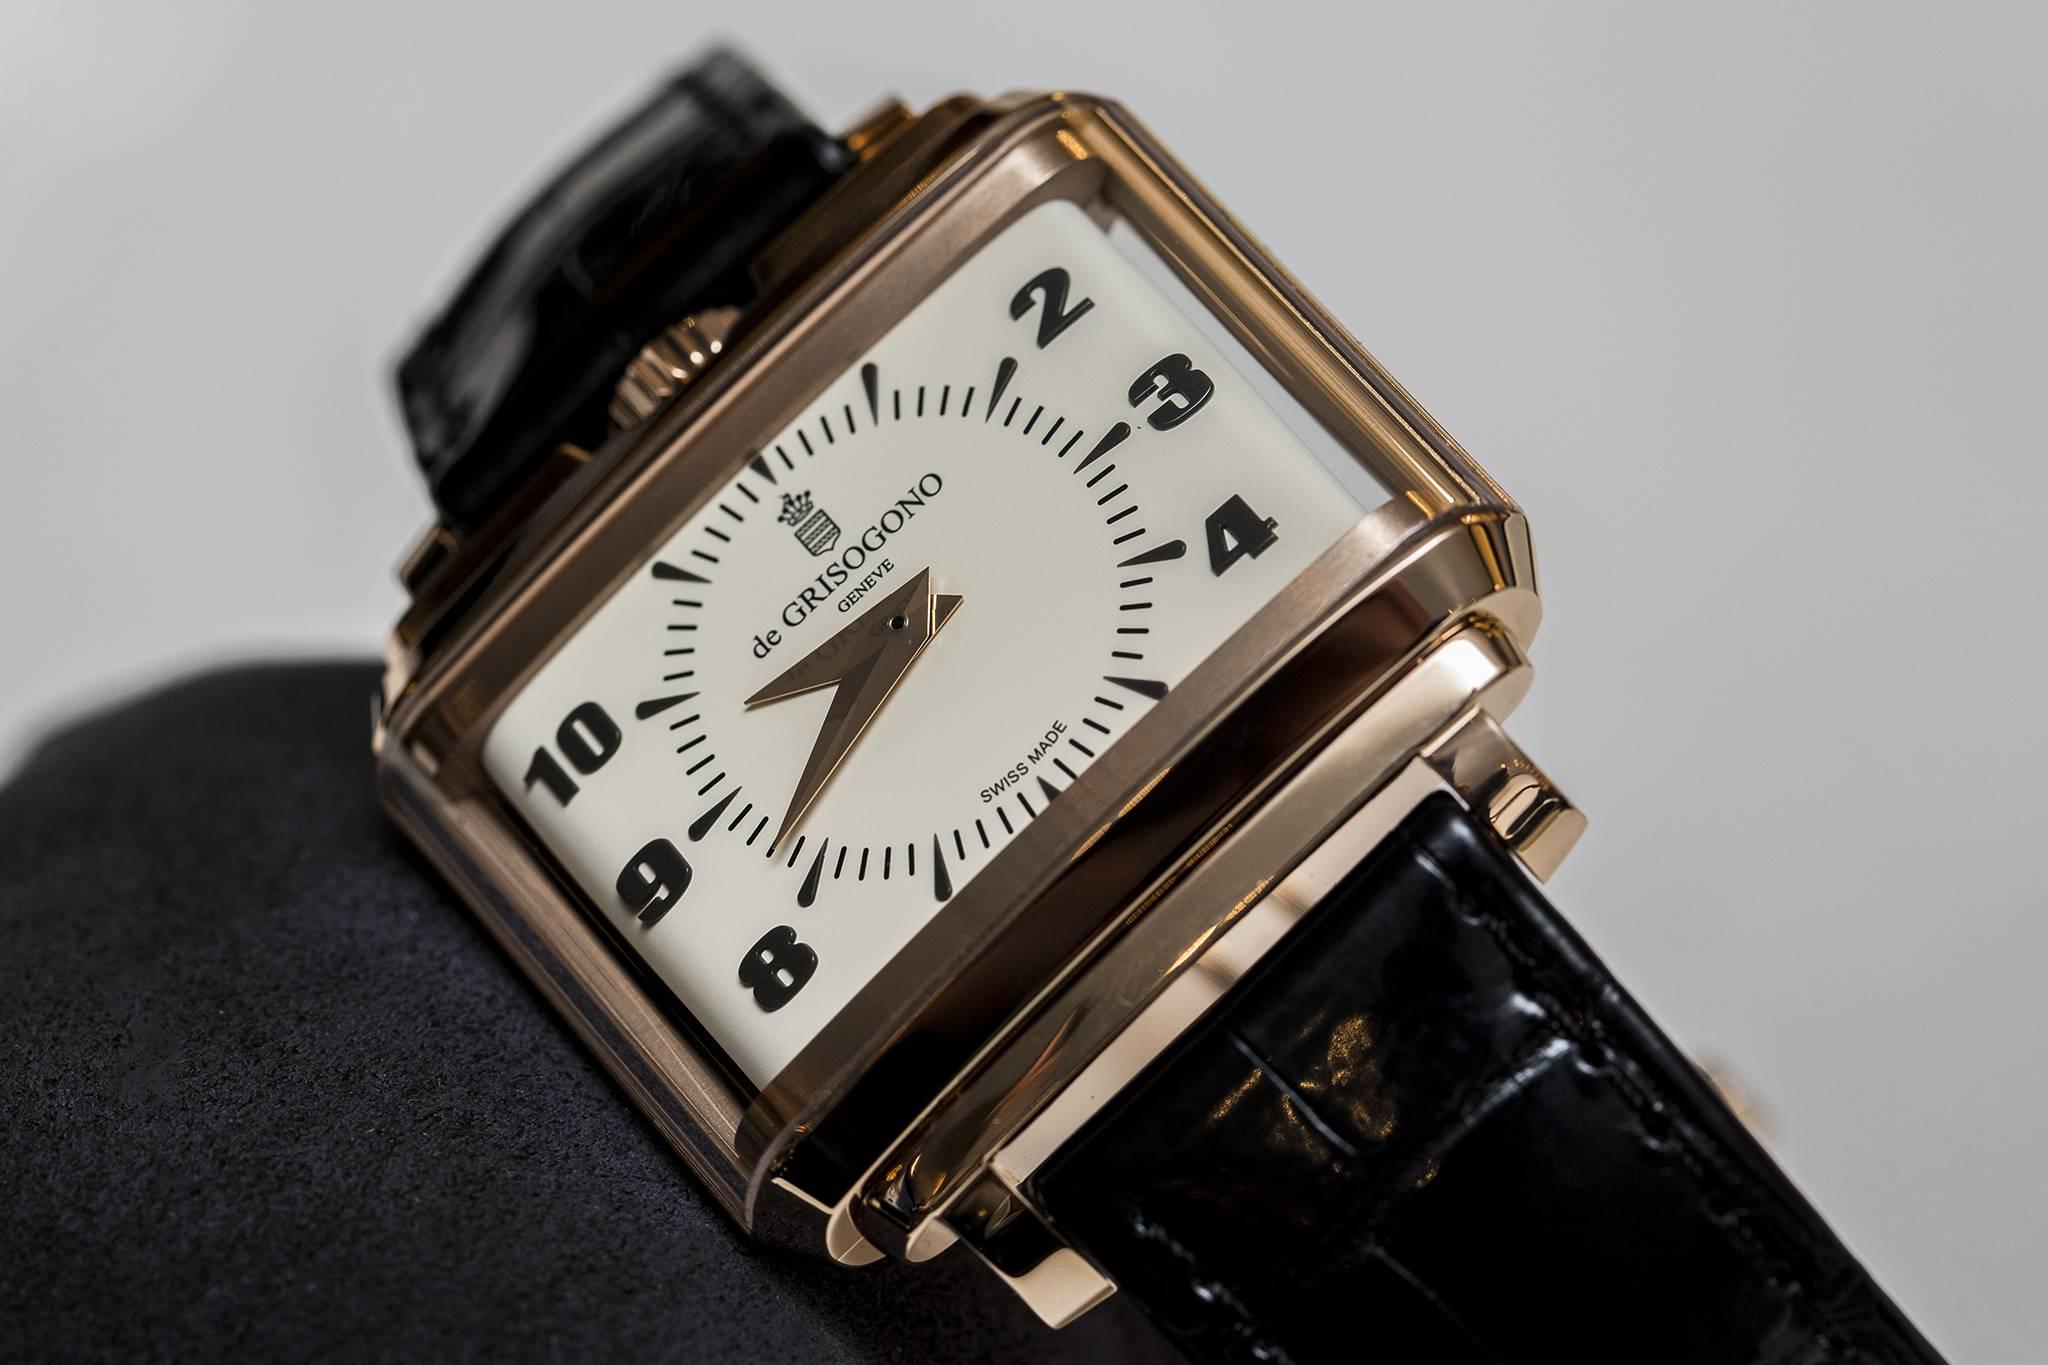 Swiss Rolex replica watches